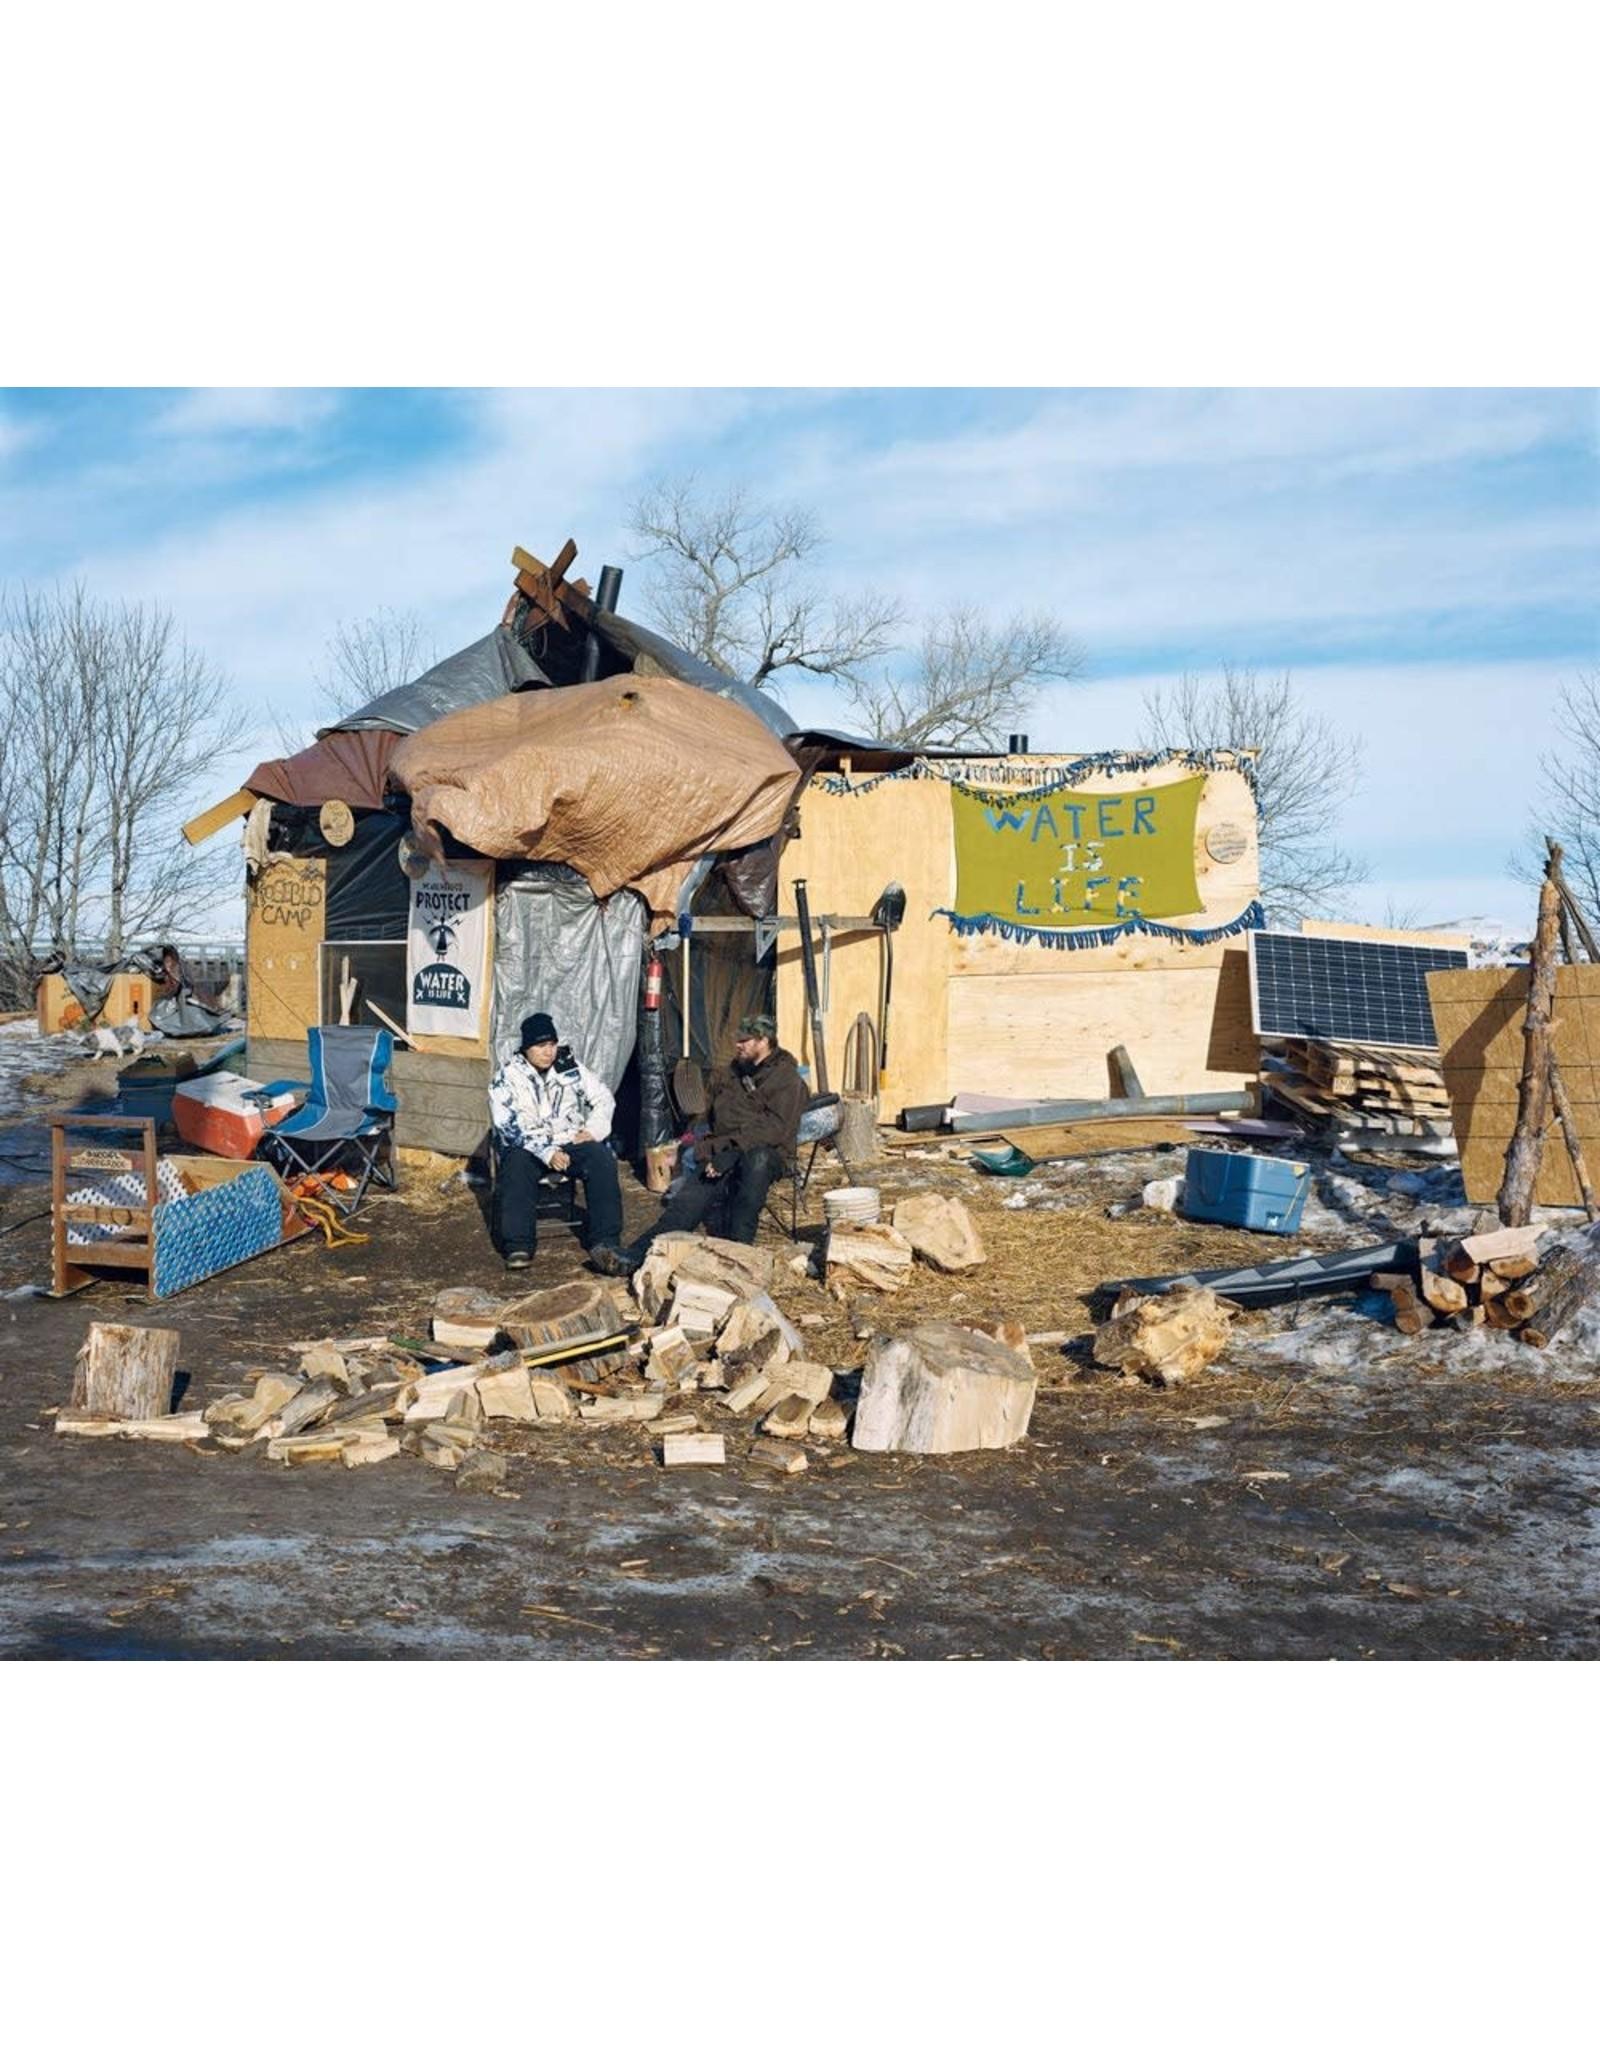 Mitch Epstein: Property Rights